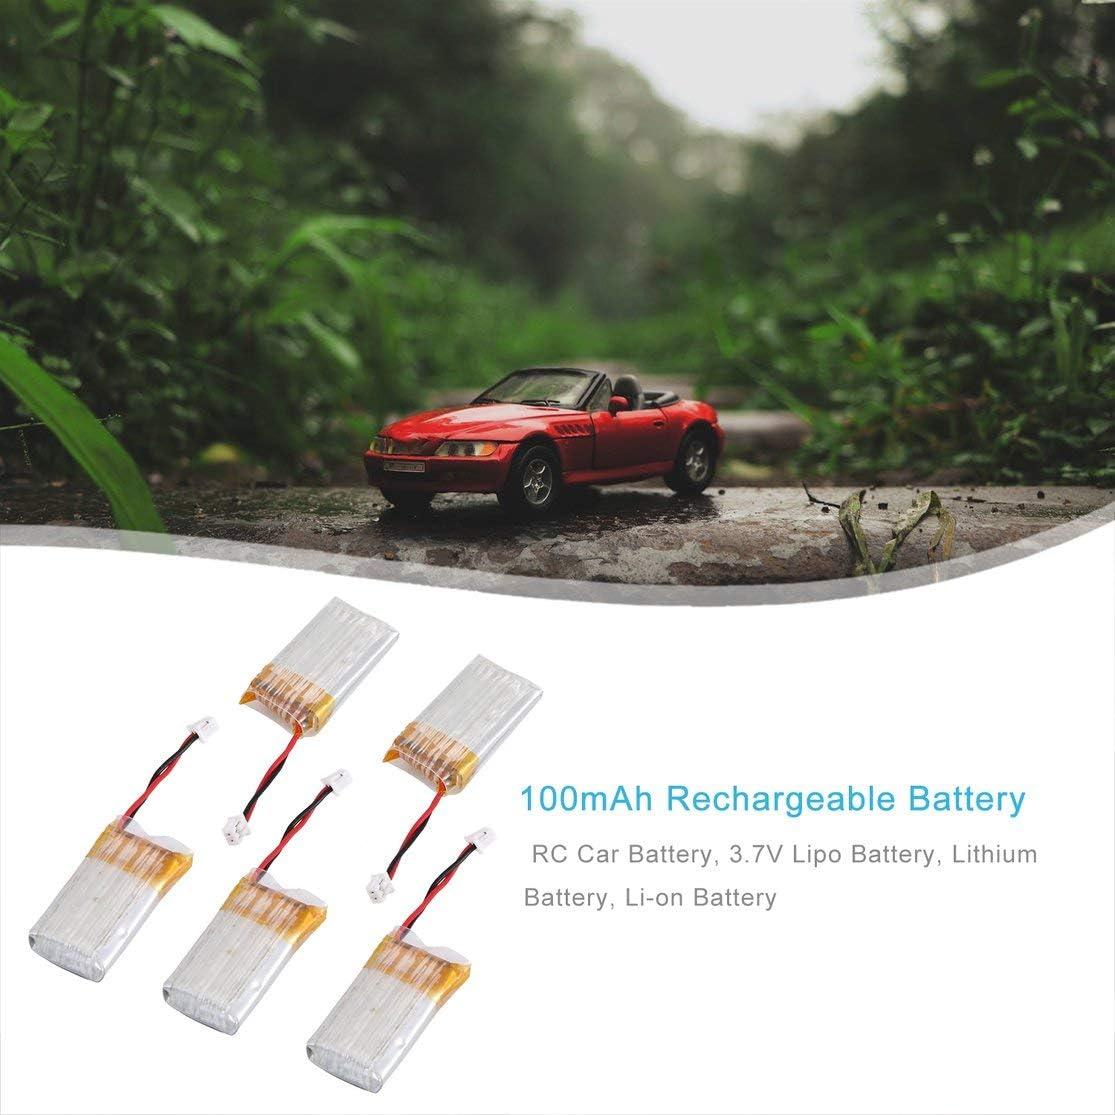 Multicolor Kaemma 3.7V 100mAh Rechargeable Battery Lipo Battery RC Lithium Battery Li-on Battery for Mini 1//28 Mosquito Car RC Car Set